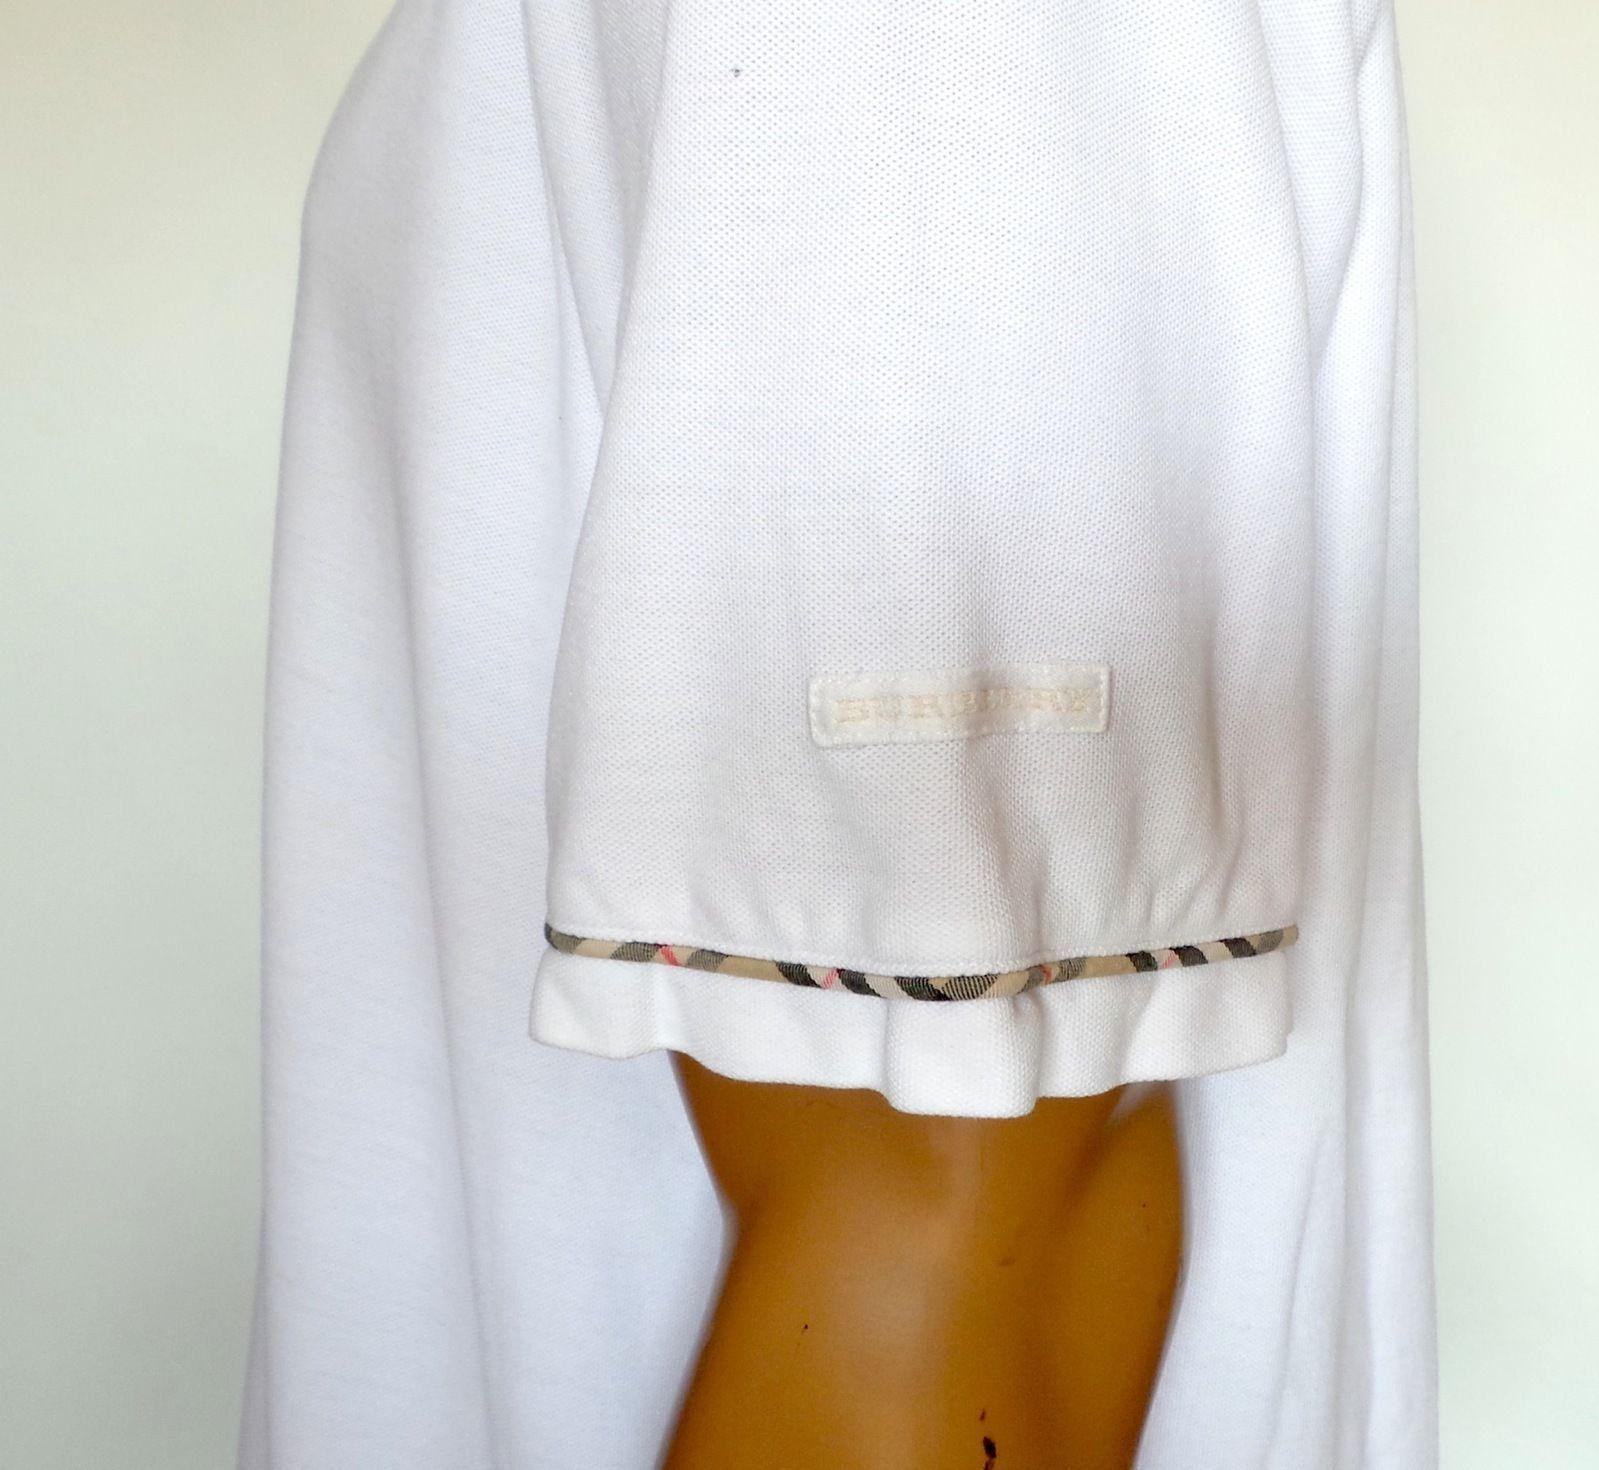 Burberry Golf Polo Men's Casual Short Sleeve Shirt Size XL Nova Check Plaid | eBay